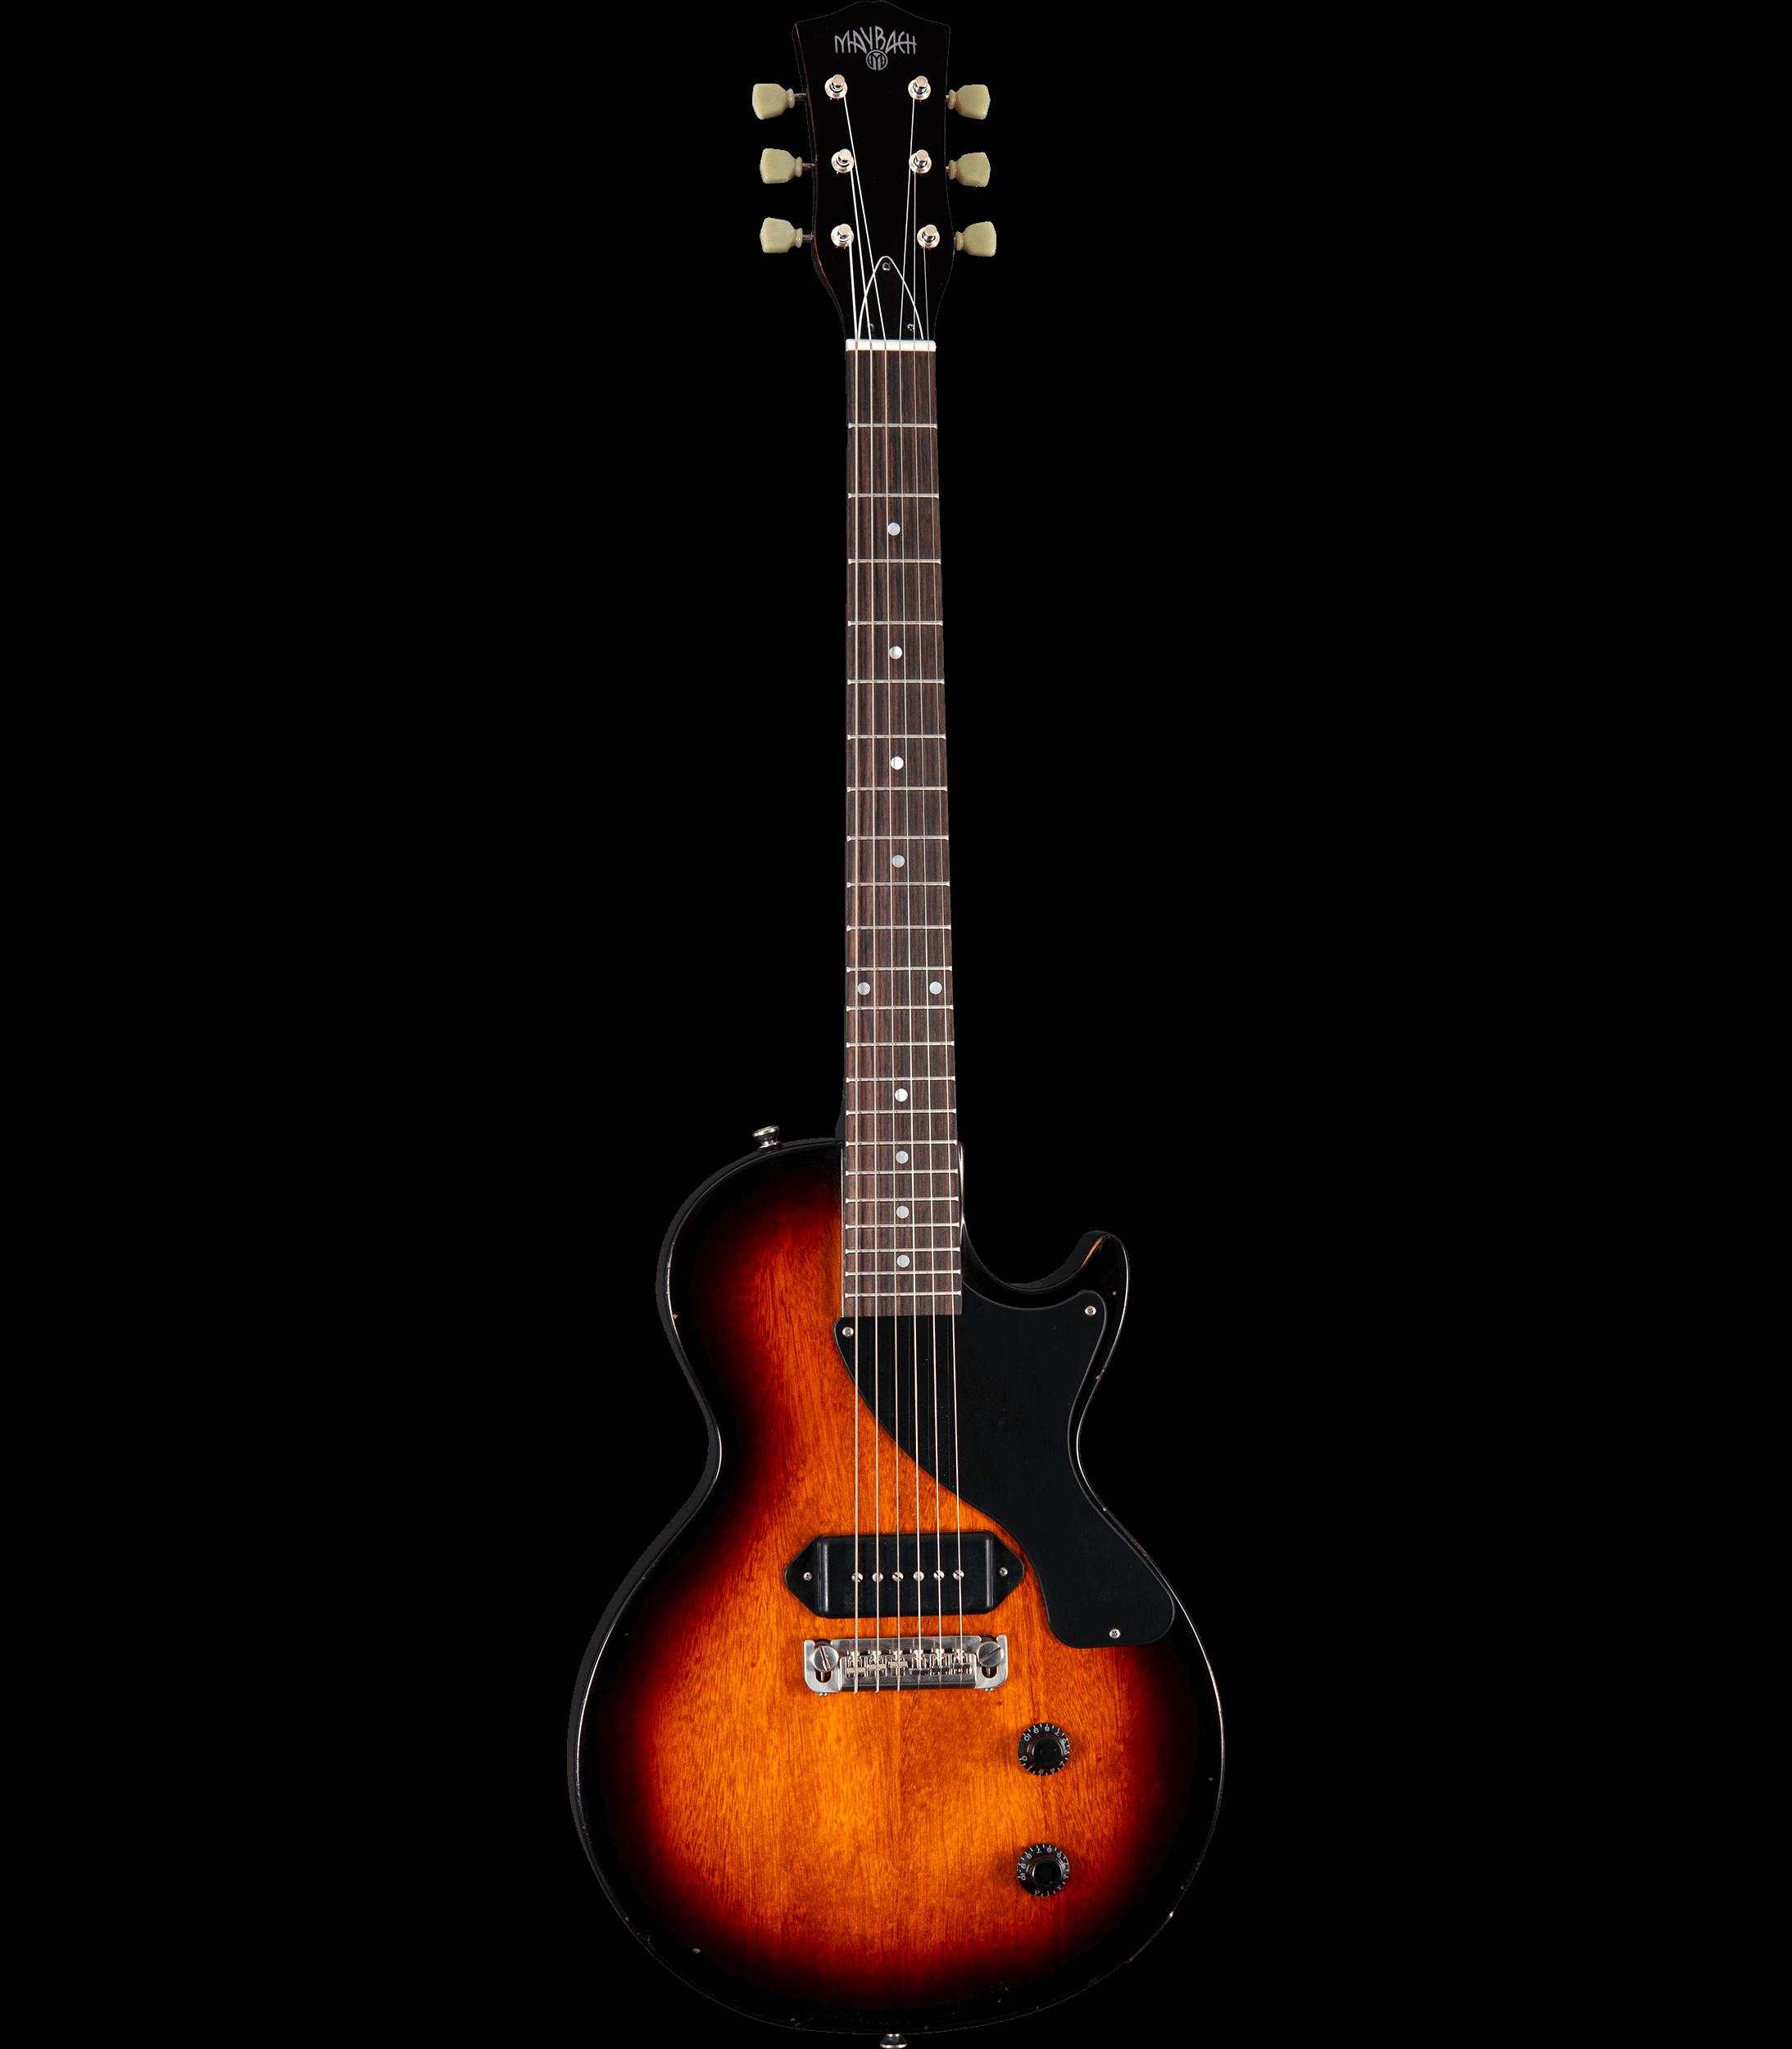 Maybach Lester Jr. Single Cut 2-Tone Sunburst